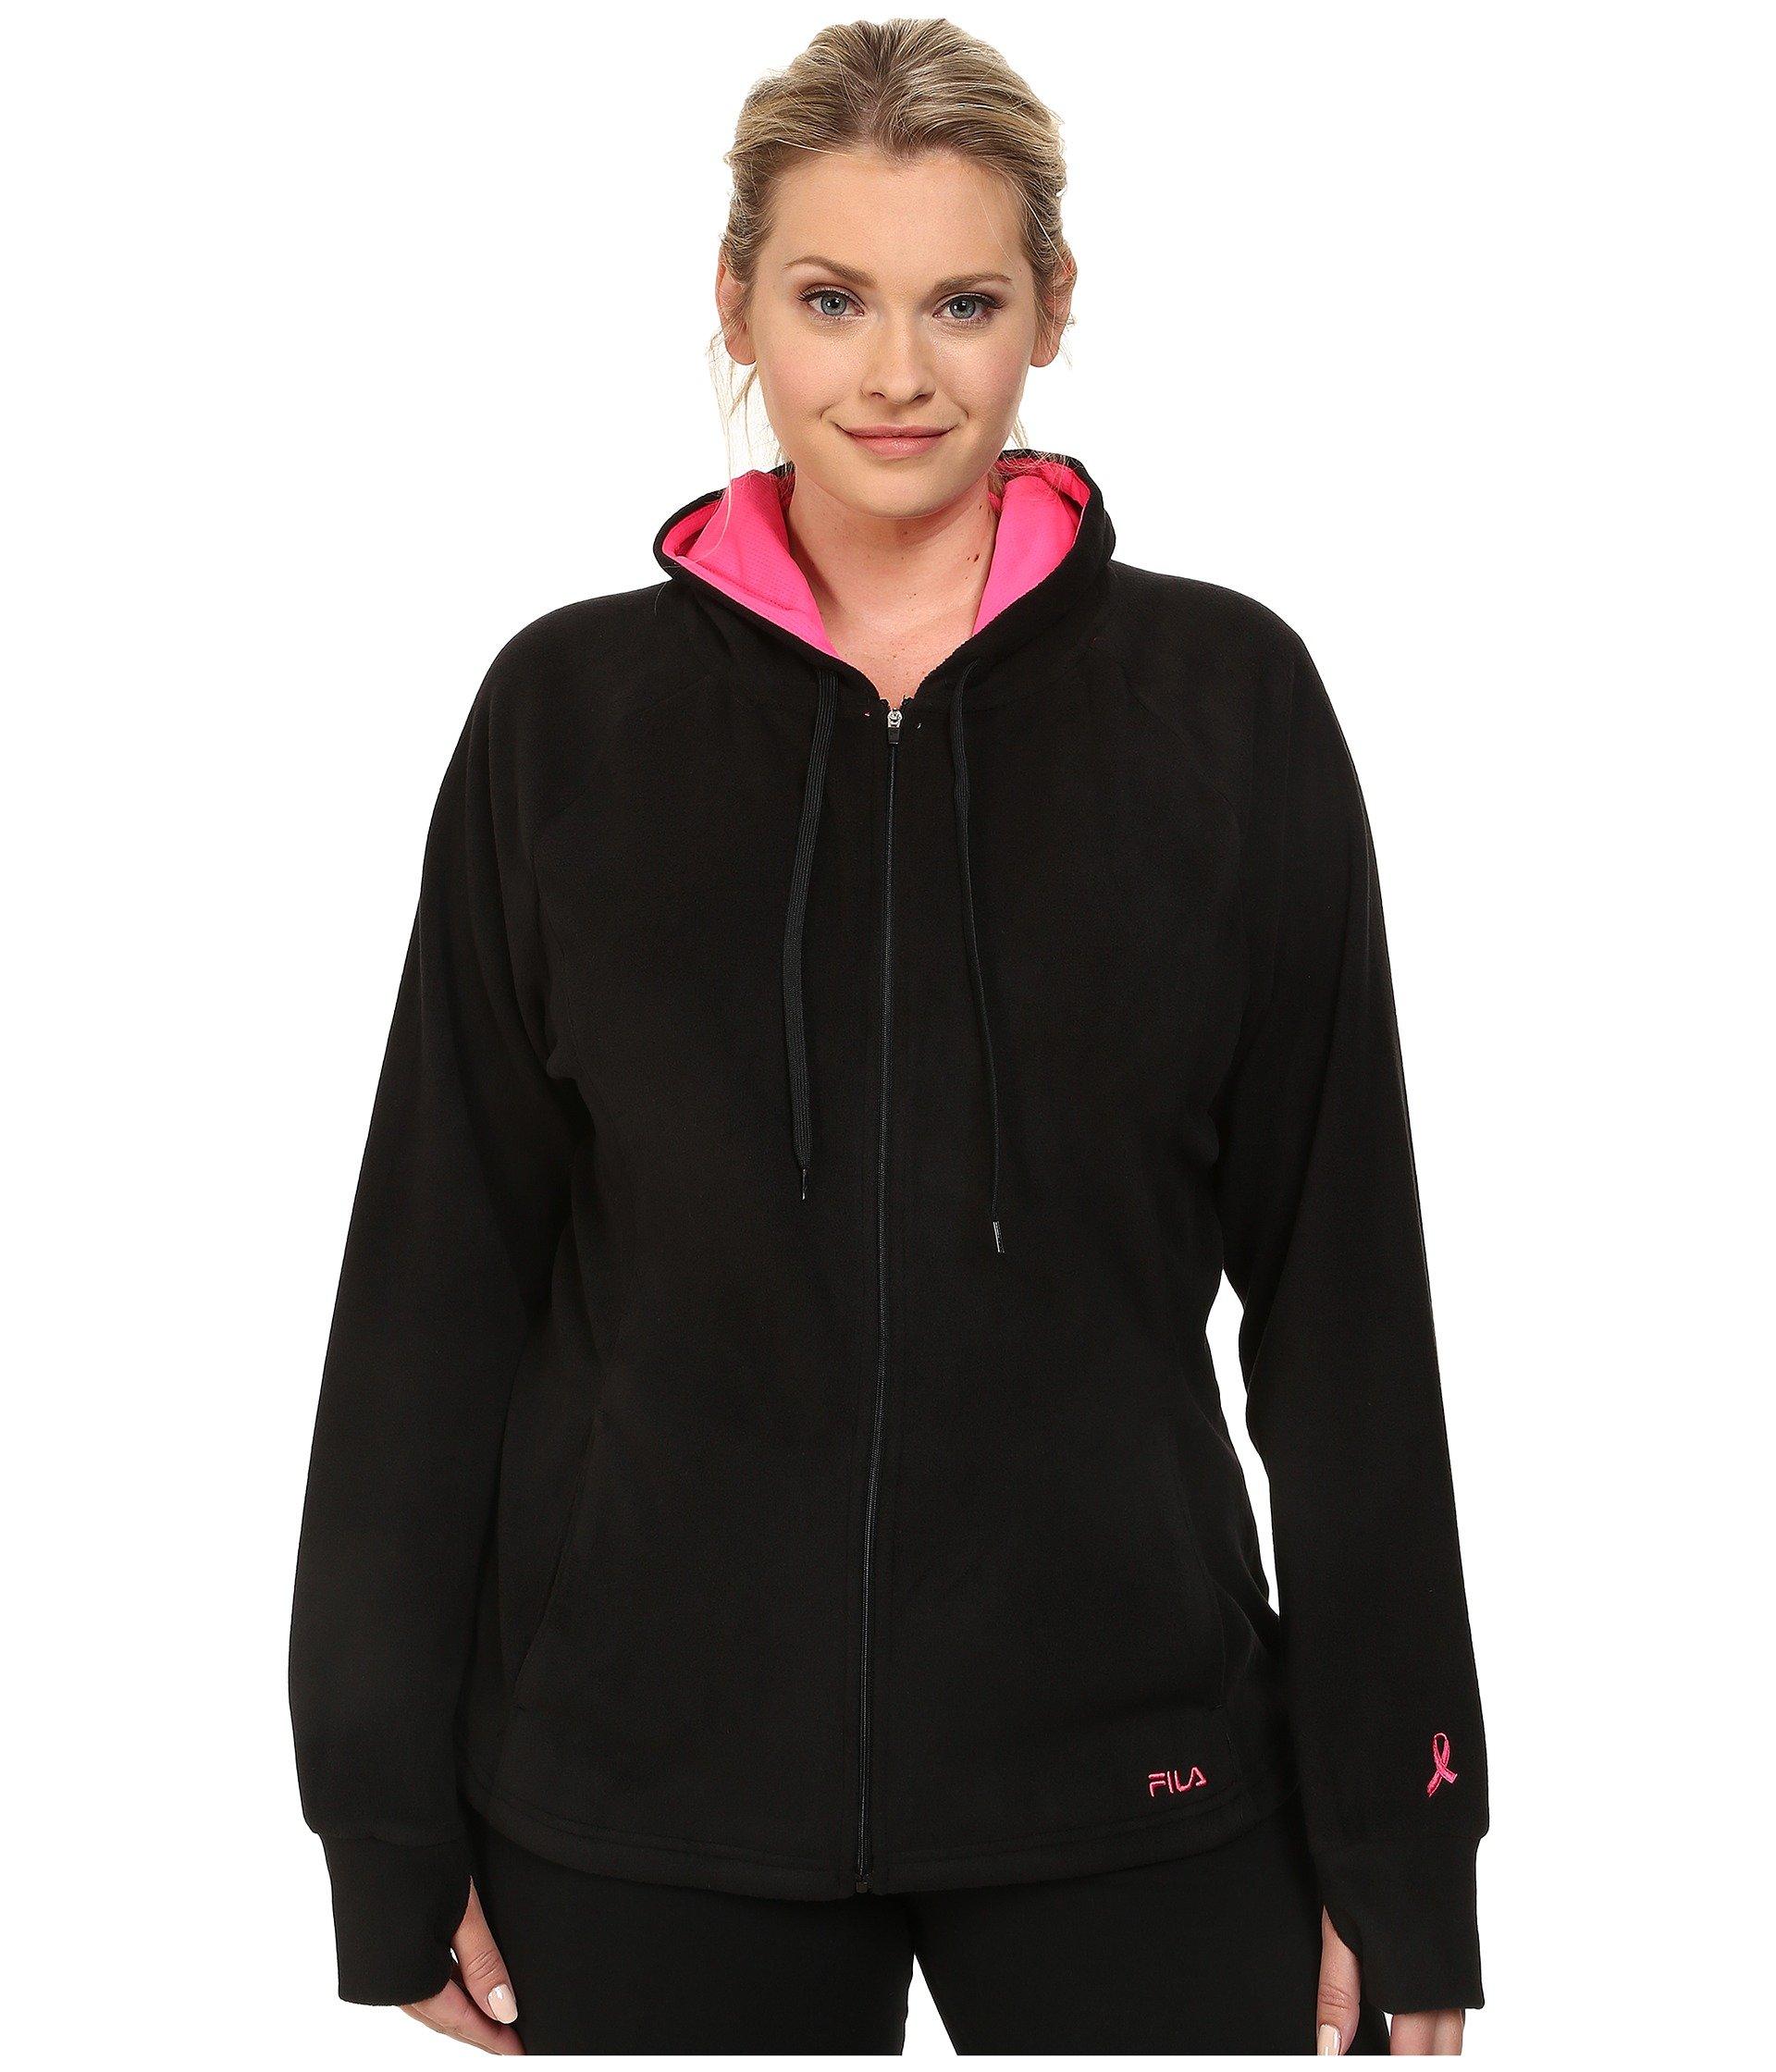 Buzo o Chaqueta para Mujer Fila Comfy Jacket  + Fila en VeoyCompro.net